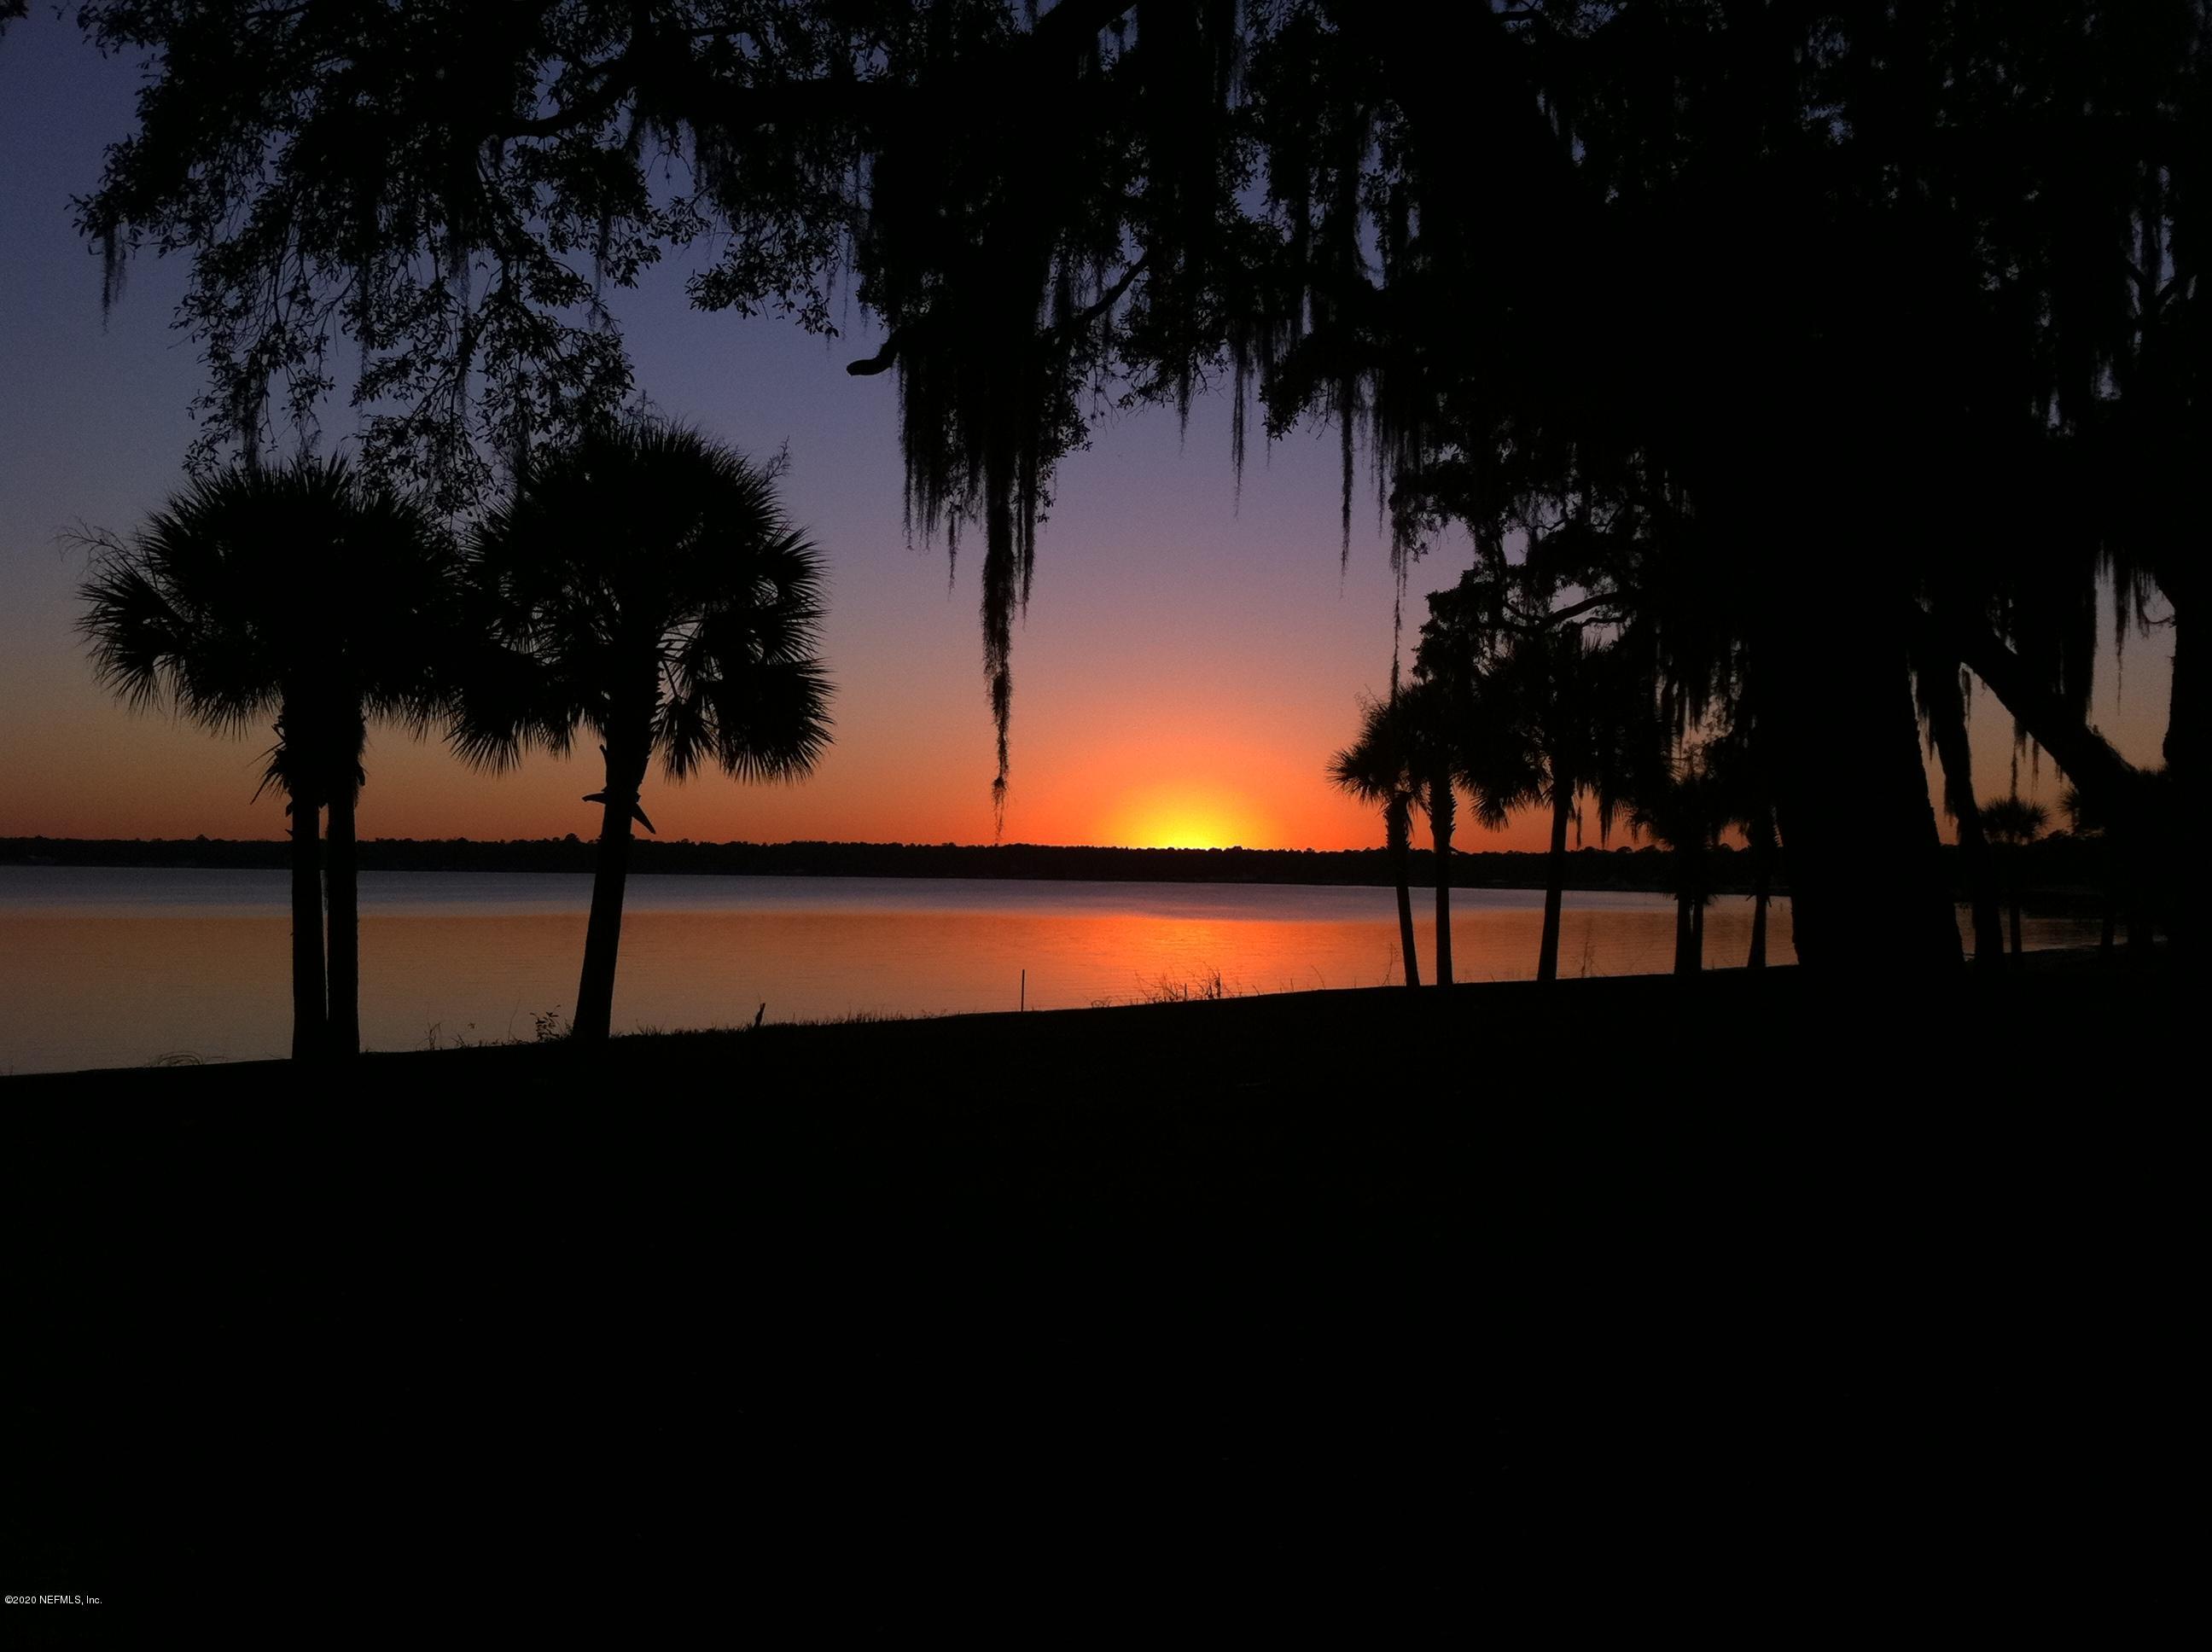 4030 BUENA VISTA, STARKE, FLORIDA 32091, ,Vacant land,For sale,BUENA VISTA,1080649